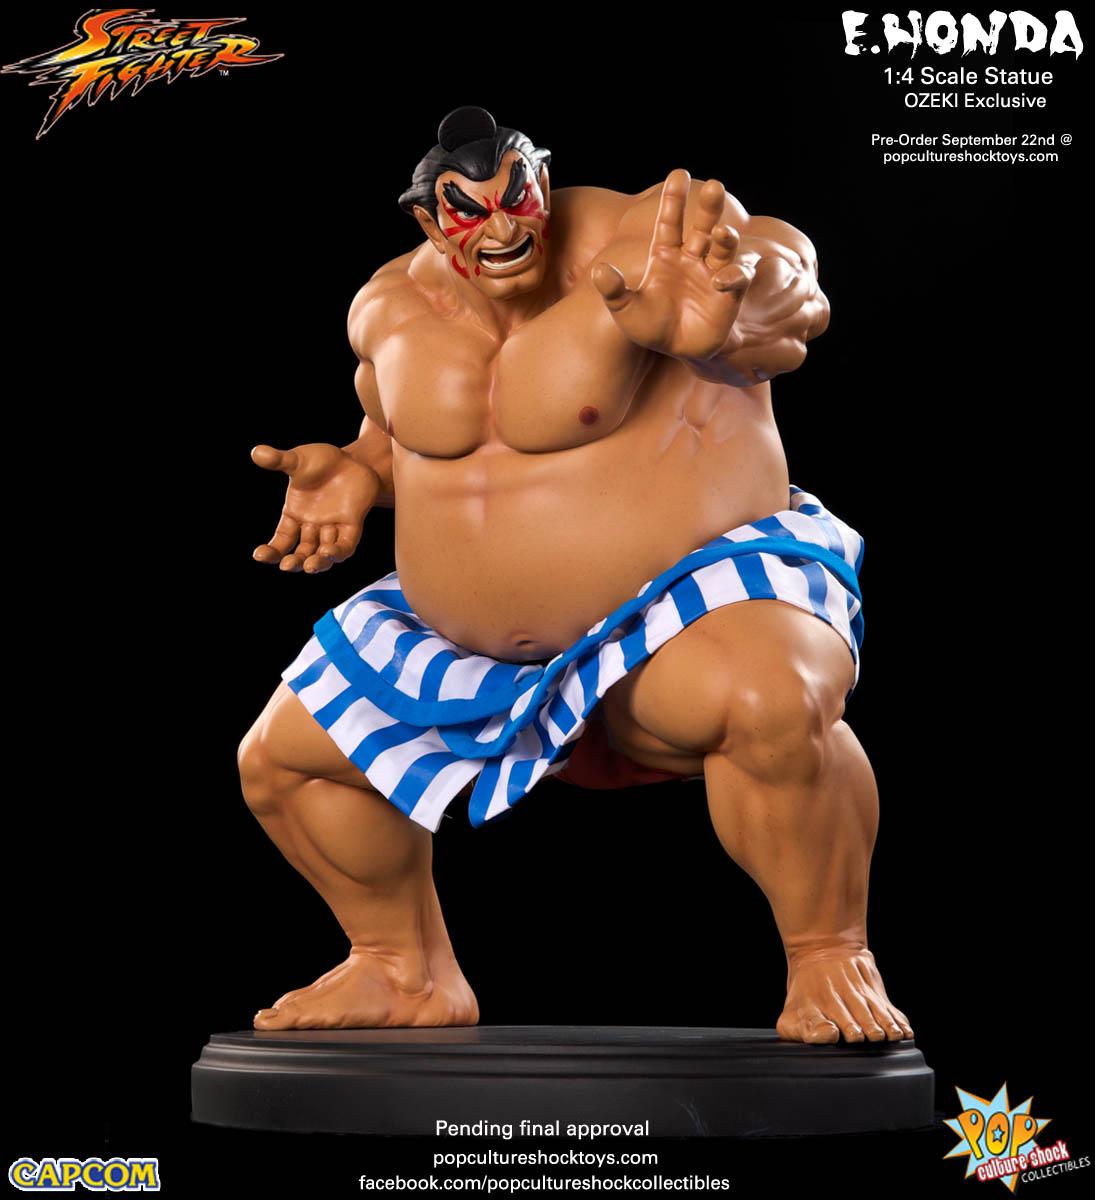 [Pop Culture Shock] Street Fighter: E. Honda 1/4 Statue - Página 3 Street-Fighter-E.-Honda-ozeki-Statue-003